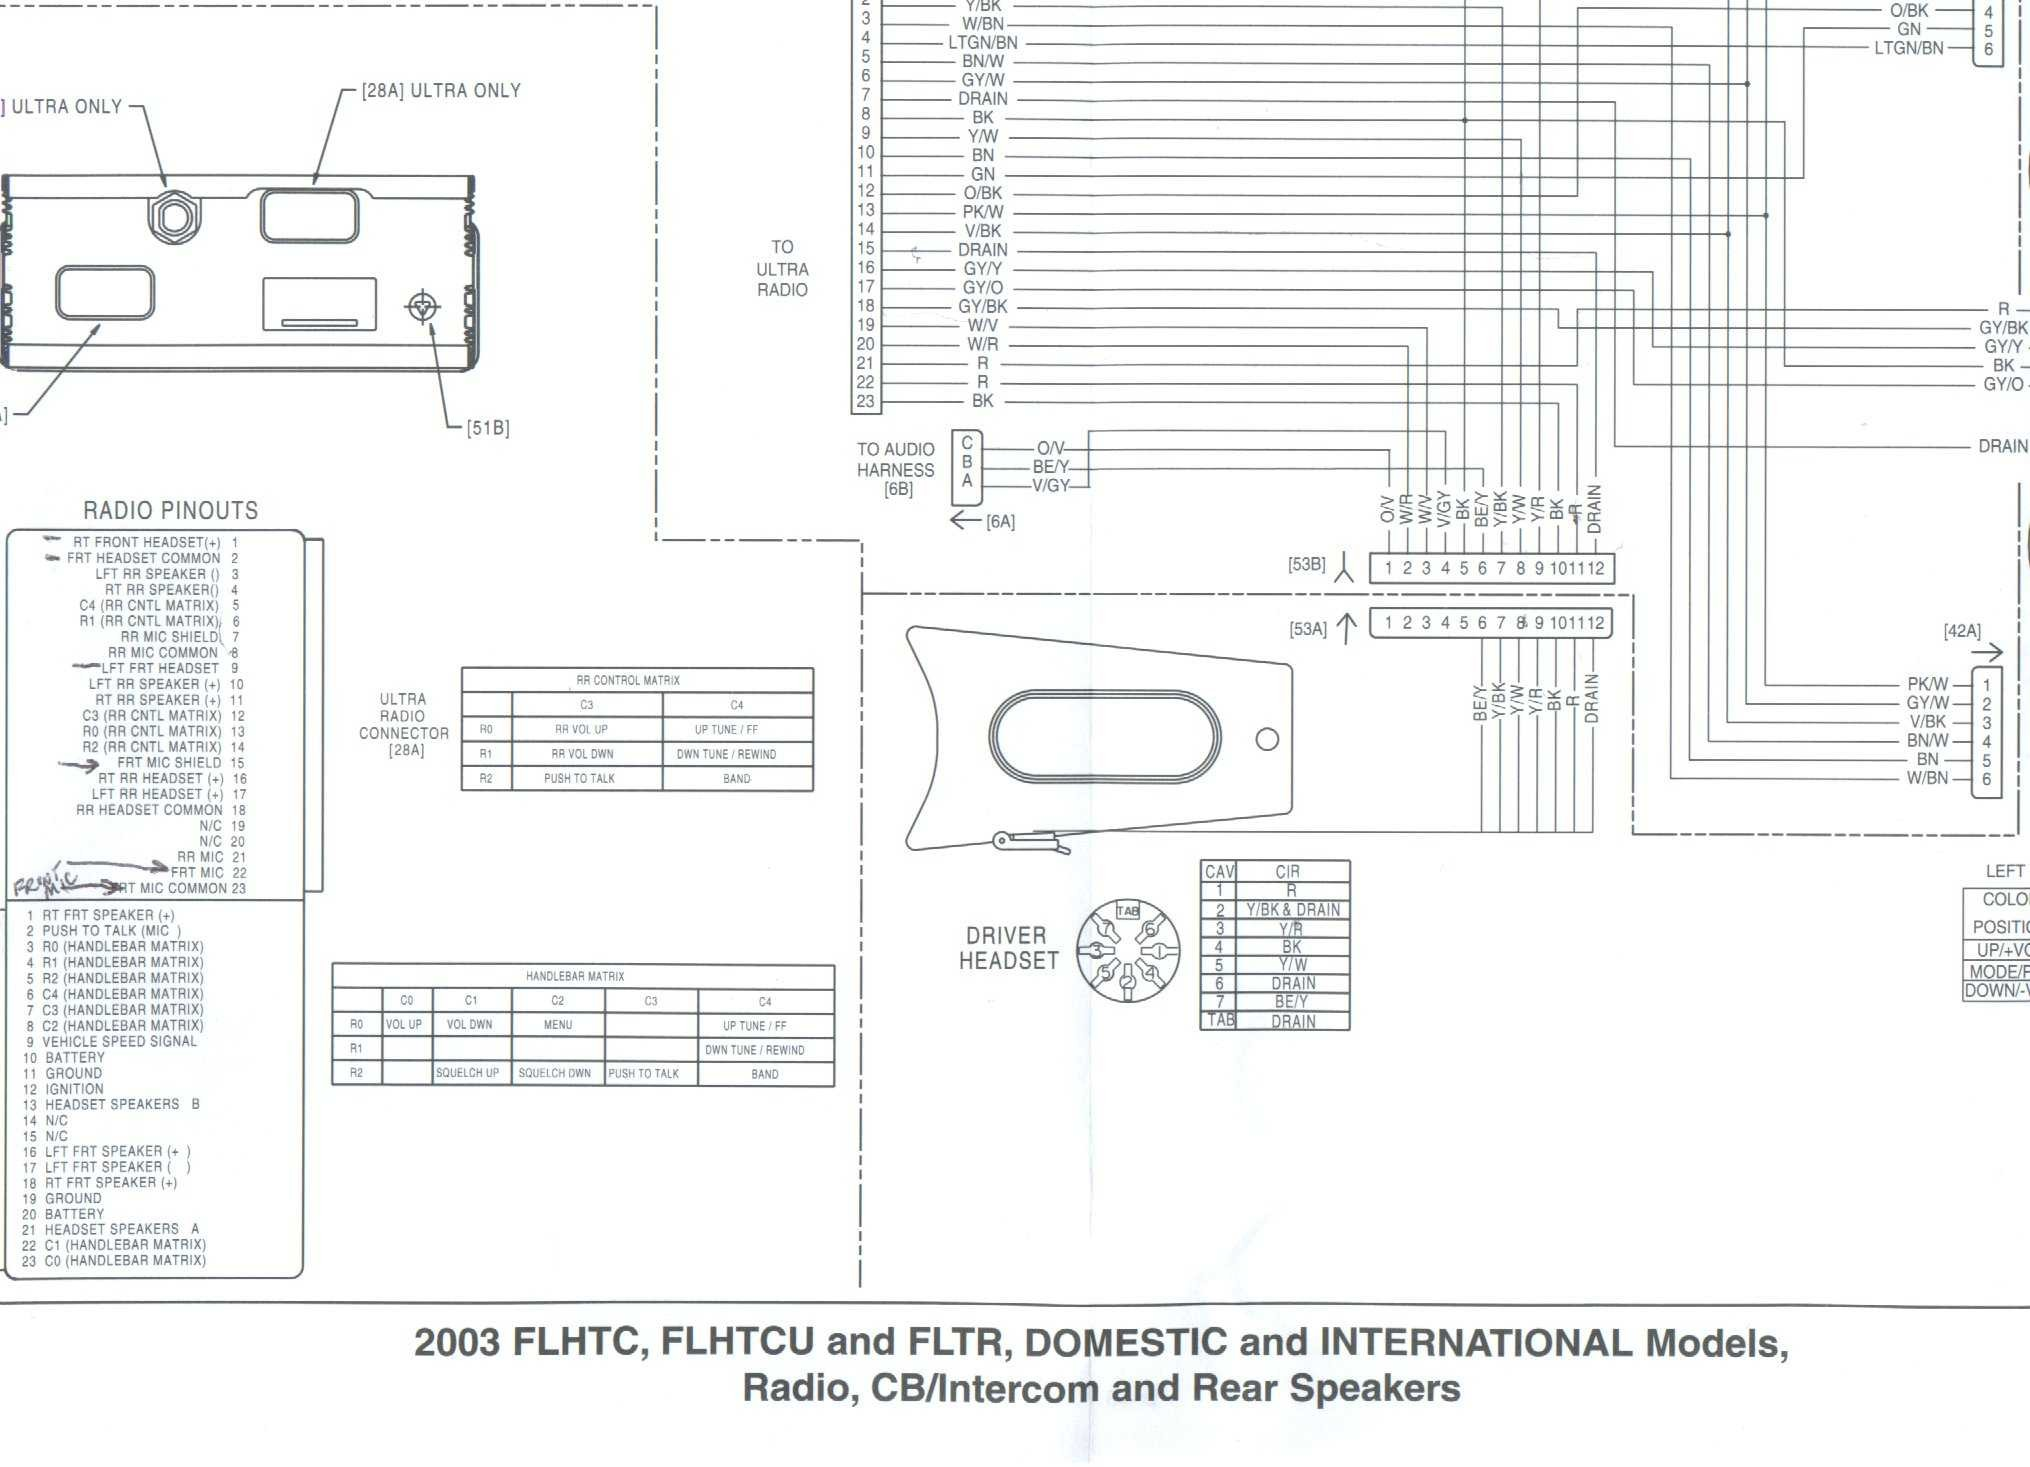 harley davidson radio wiring diagram wiring diagram image rh mainetreasurechest com Harman Kardon Wiring-Diagram Harley Dyna Wiring Diagram Light